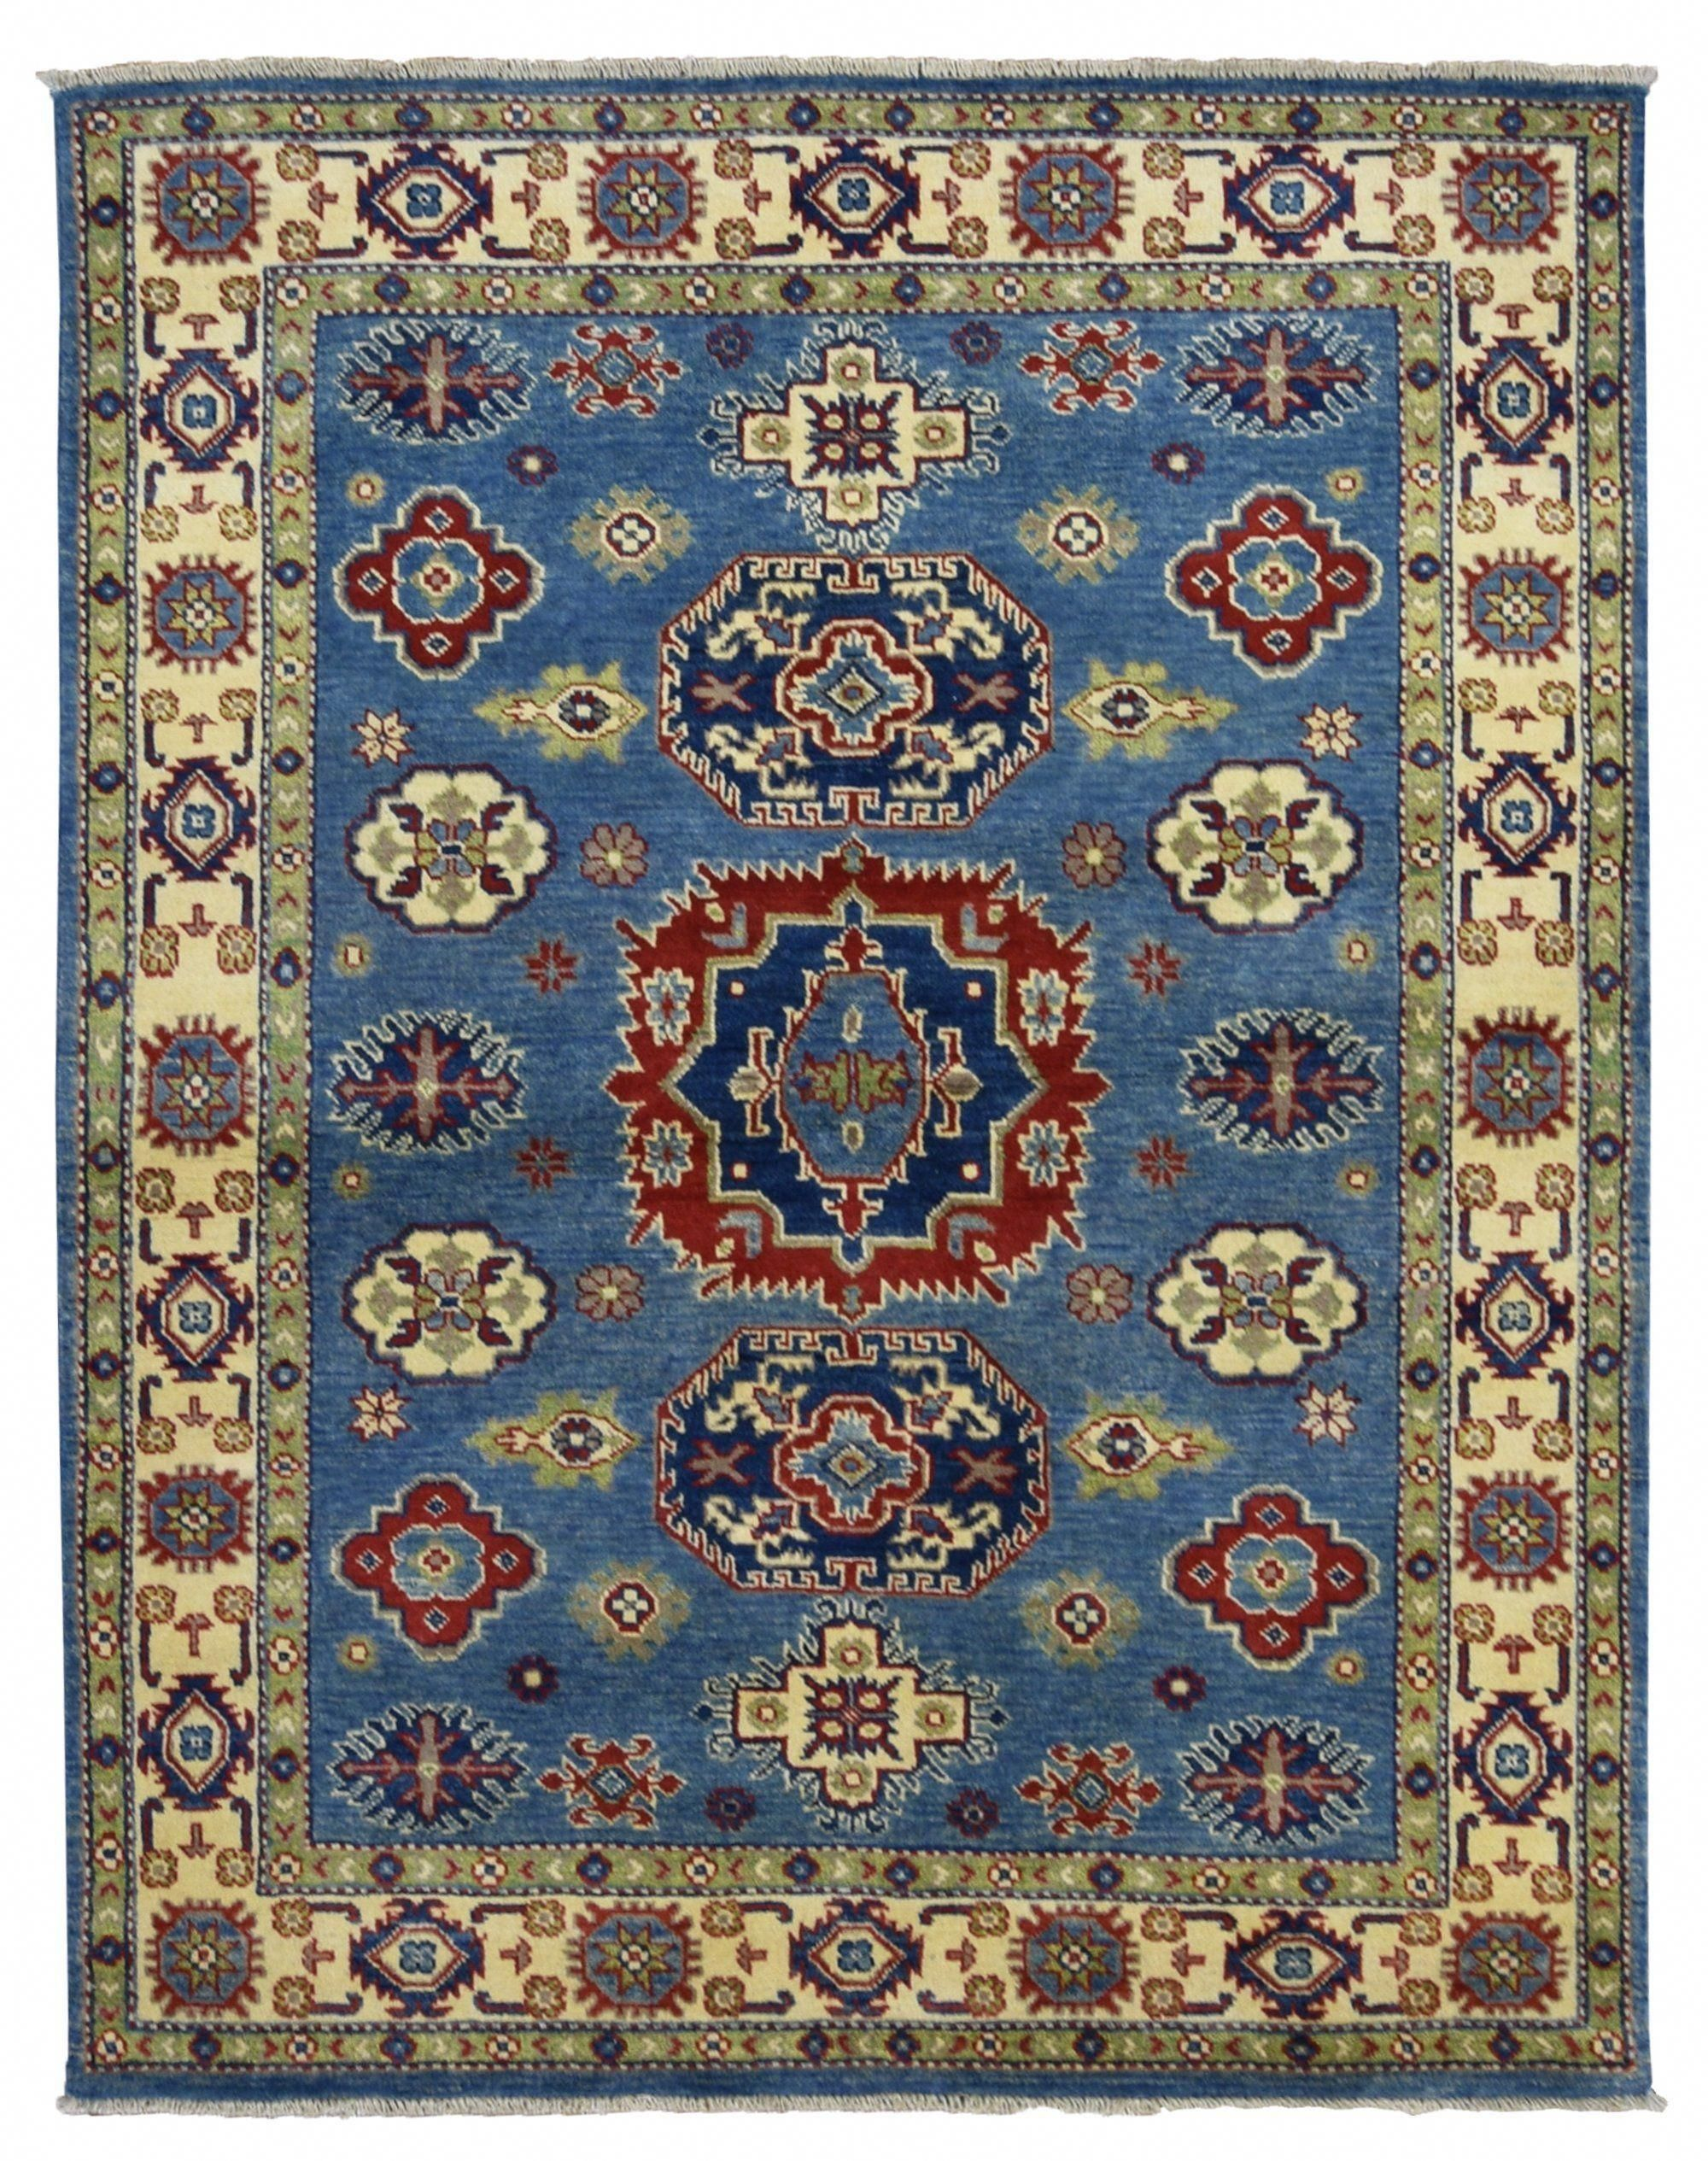 Carpet Runners Home Hardware Carpetrunnersinstallation Key 3767629549 In 2020 Rugs Area Rugs Persian Heriz Rug